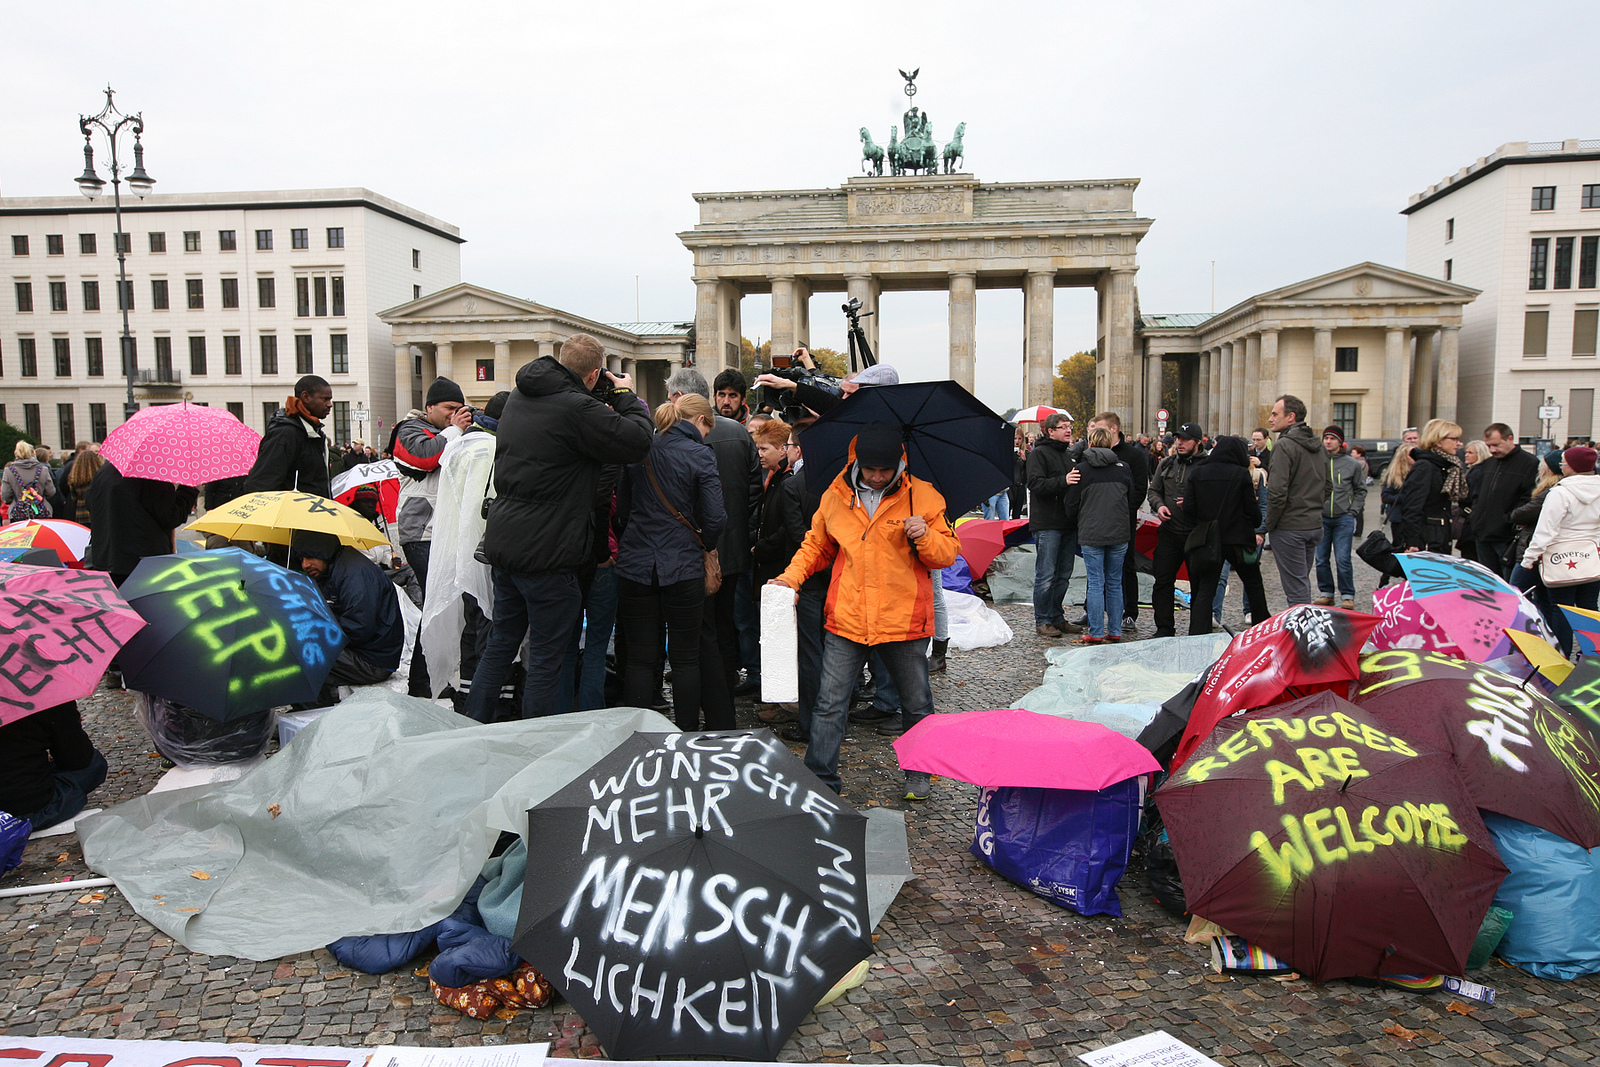 Protesters occupy Berlin's Pariser Platz in front of the Brandenburg Gate, calling for Germany to accept more refugees. Berlin 2013 [Fraktion DIE LINKE im Bundestag/Flickr]